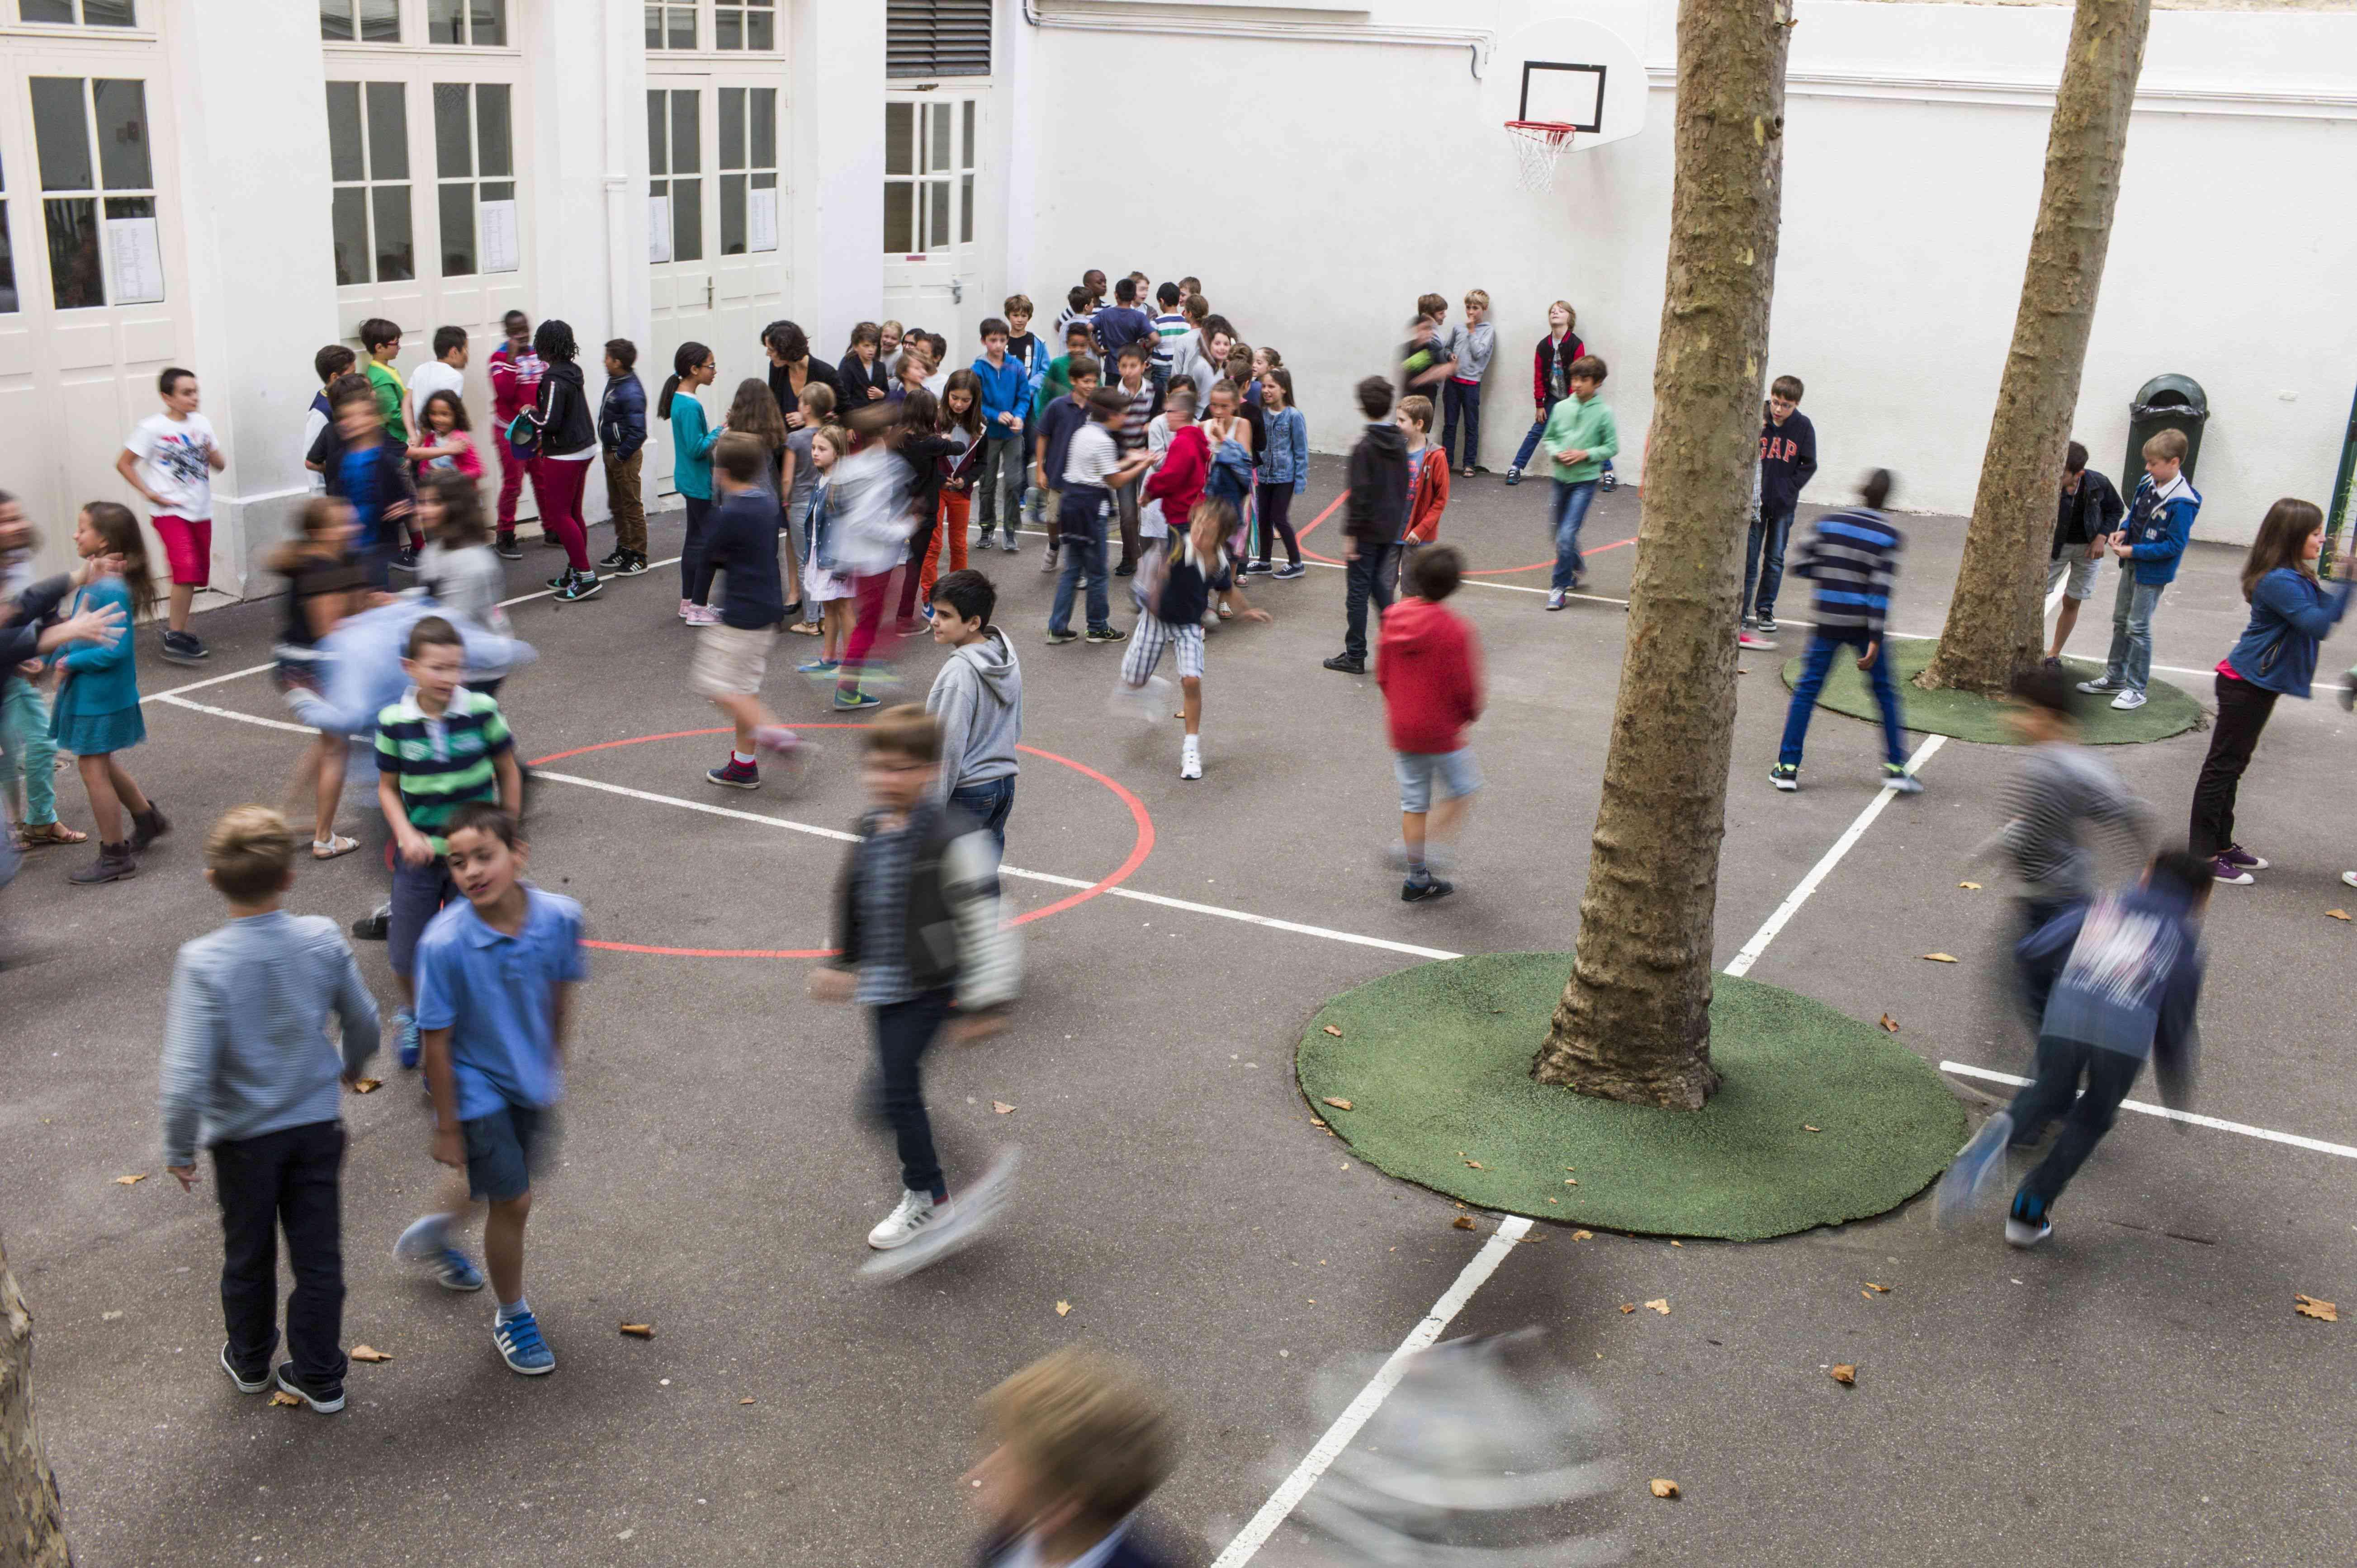 Another bustling Parisian schoolyard